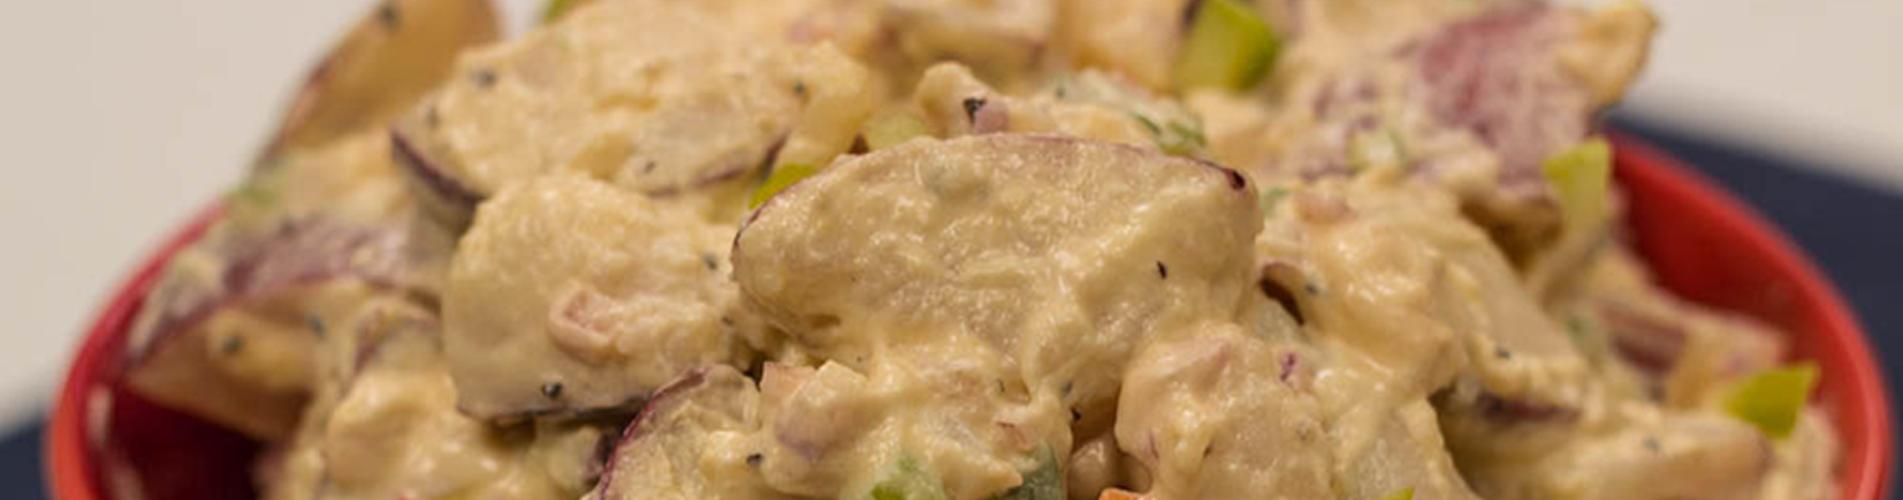 The pototato salad